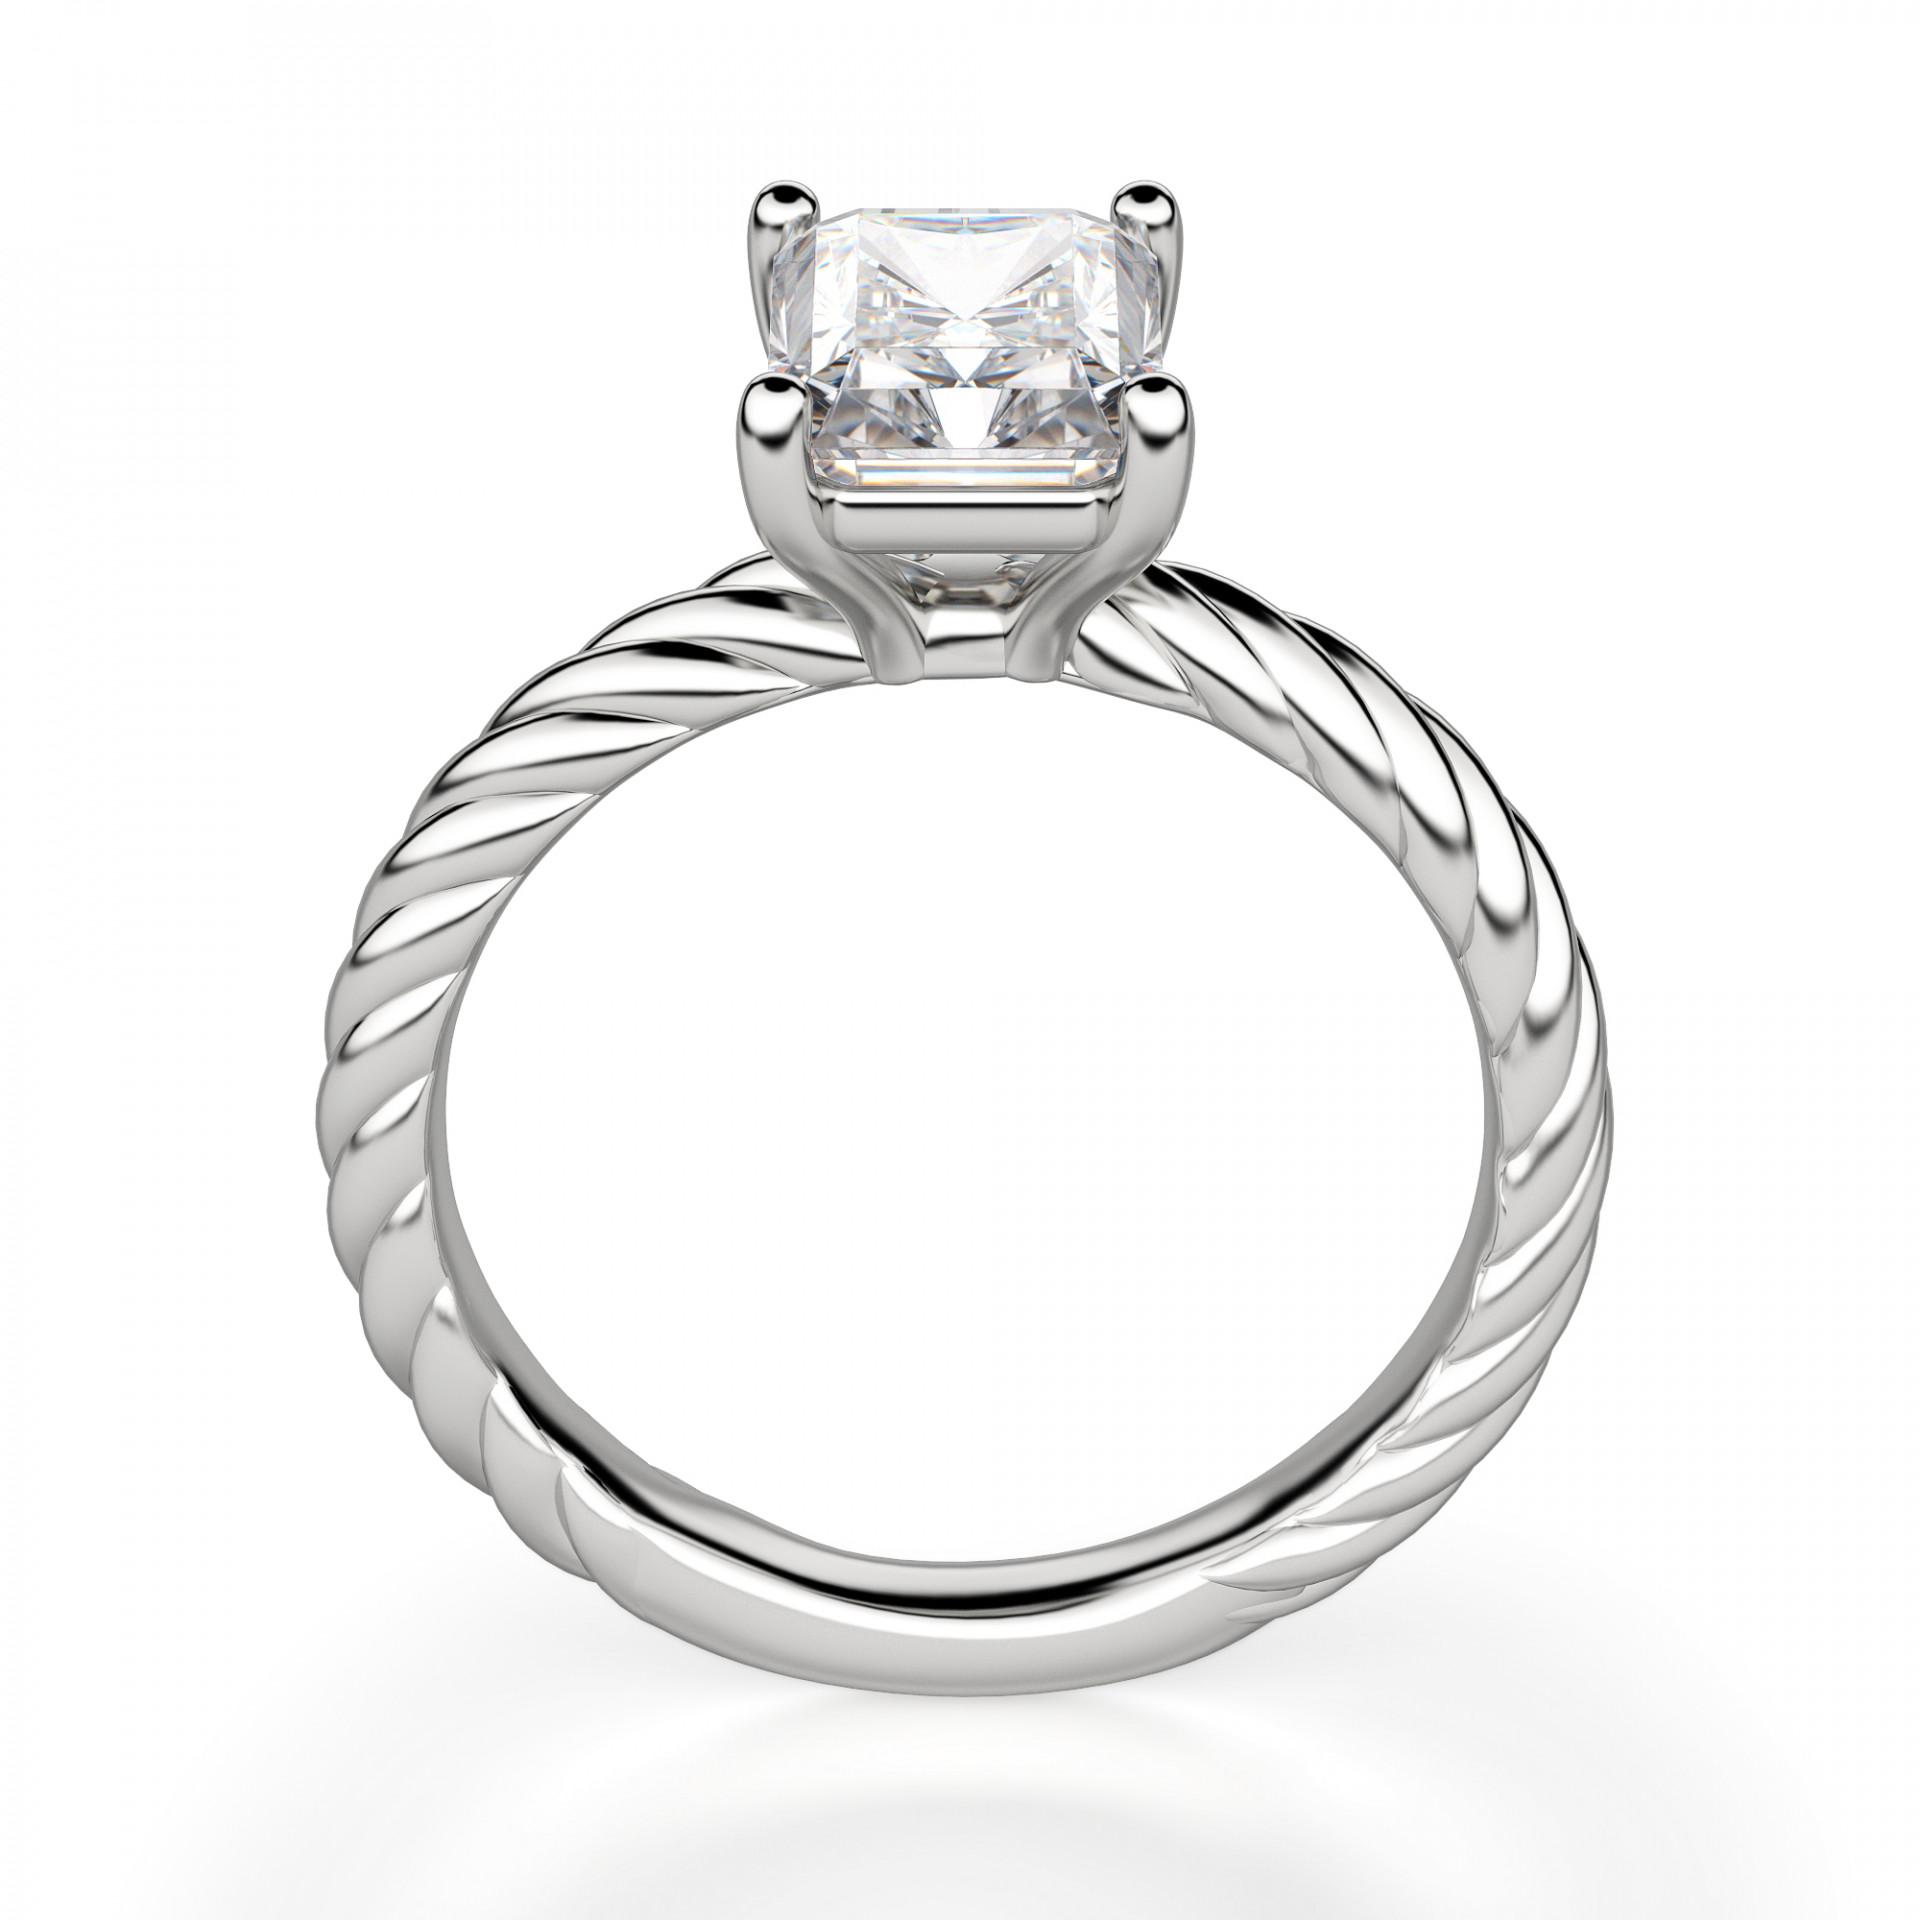 fiji radiant cut engagement ring Fiji Island Getaways 1